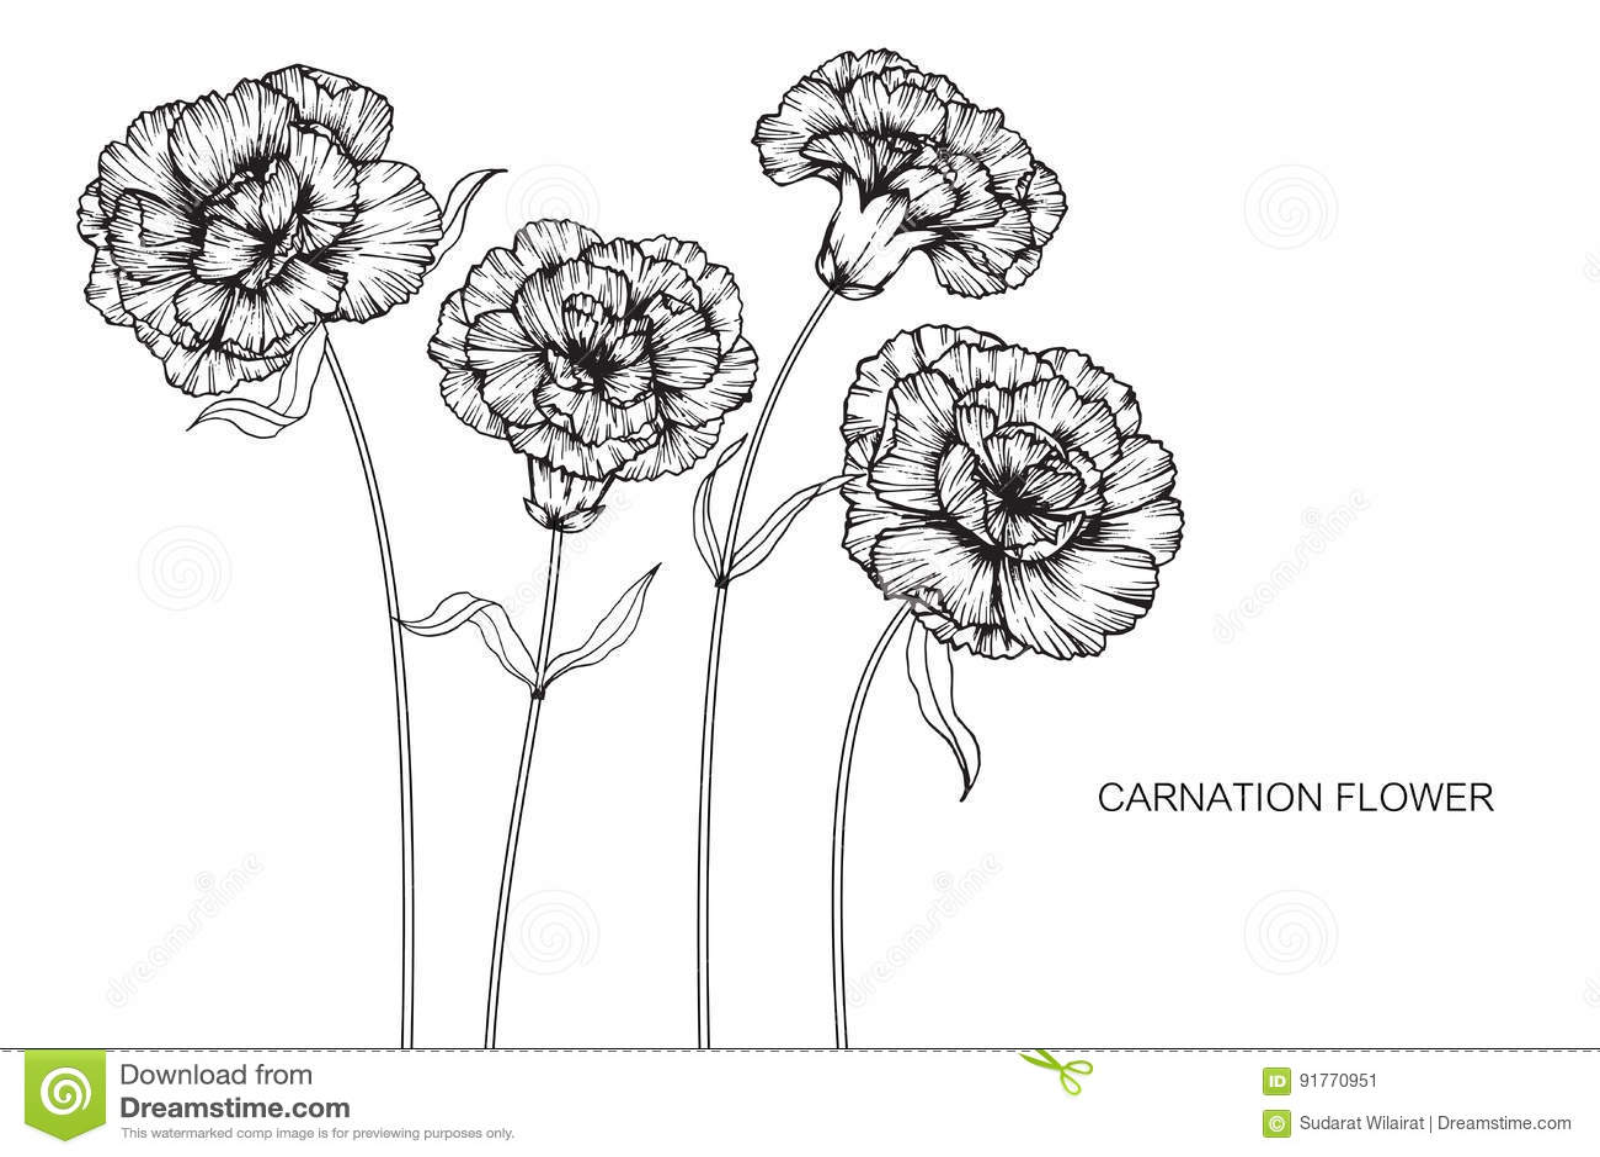 carnation leaf diagram